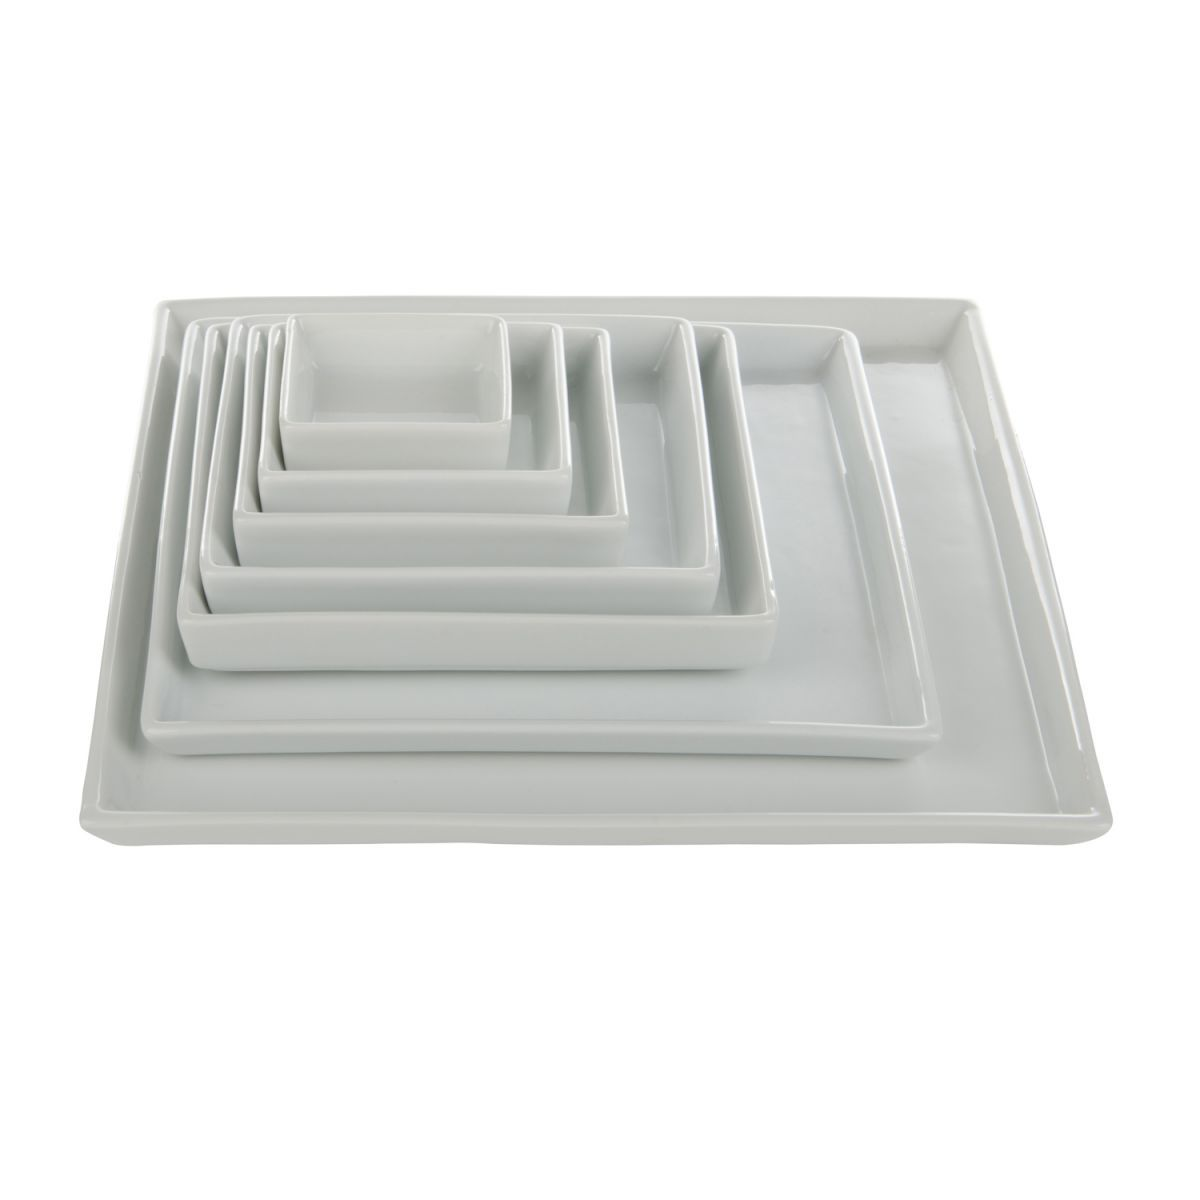 bord porselein vierkant wit 15x15cmbox 12